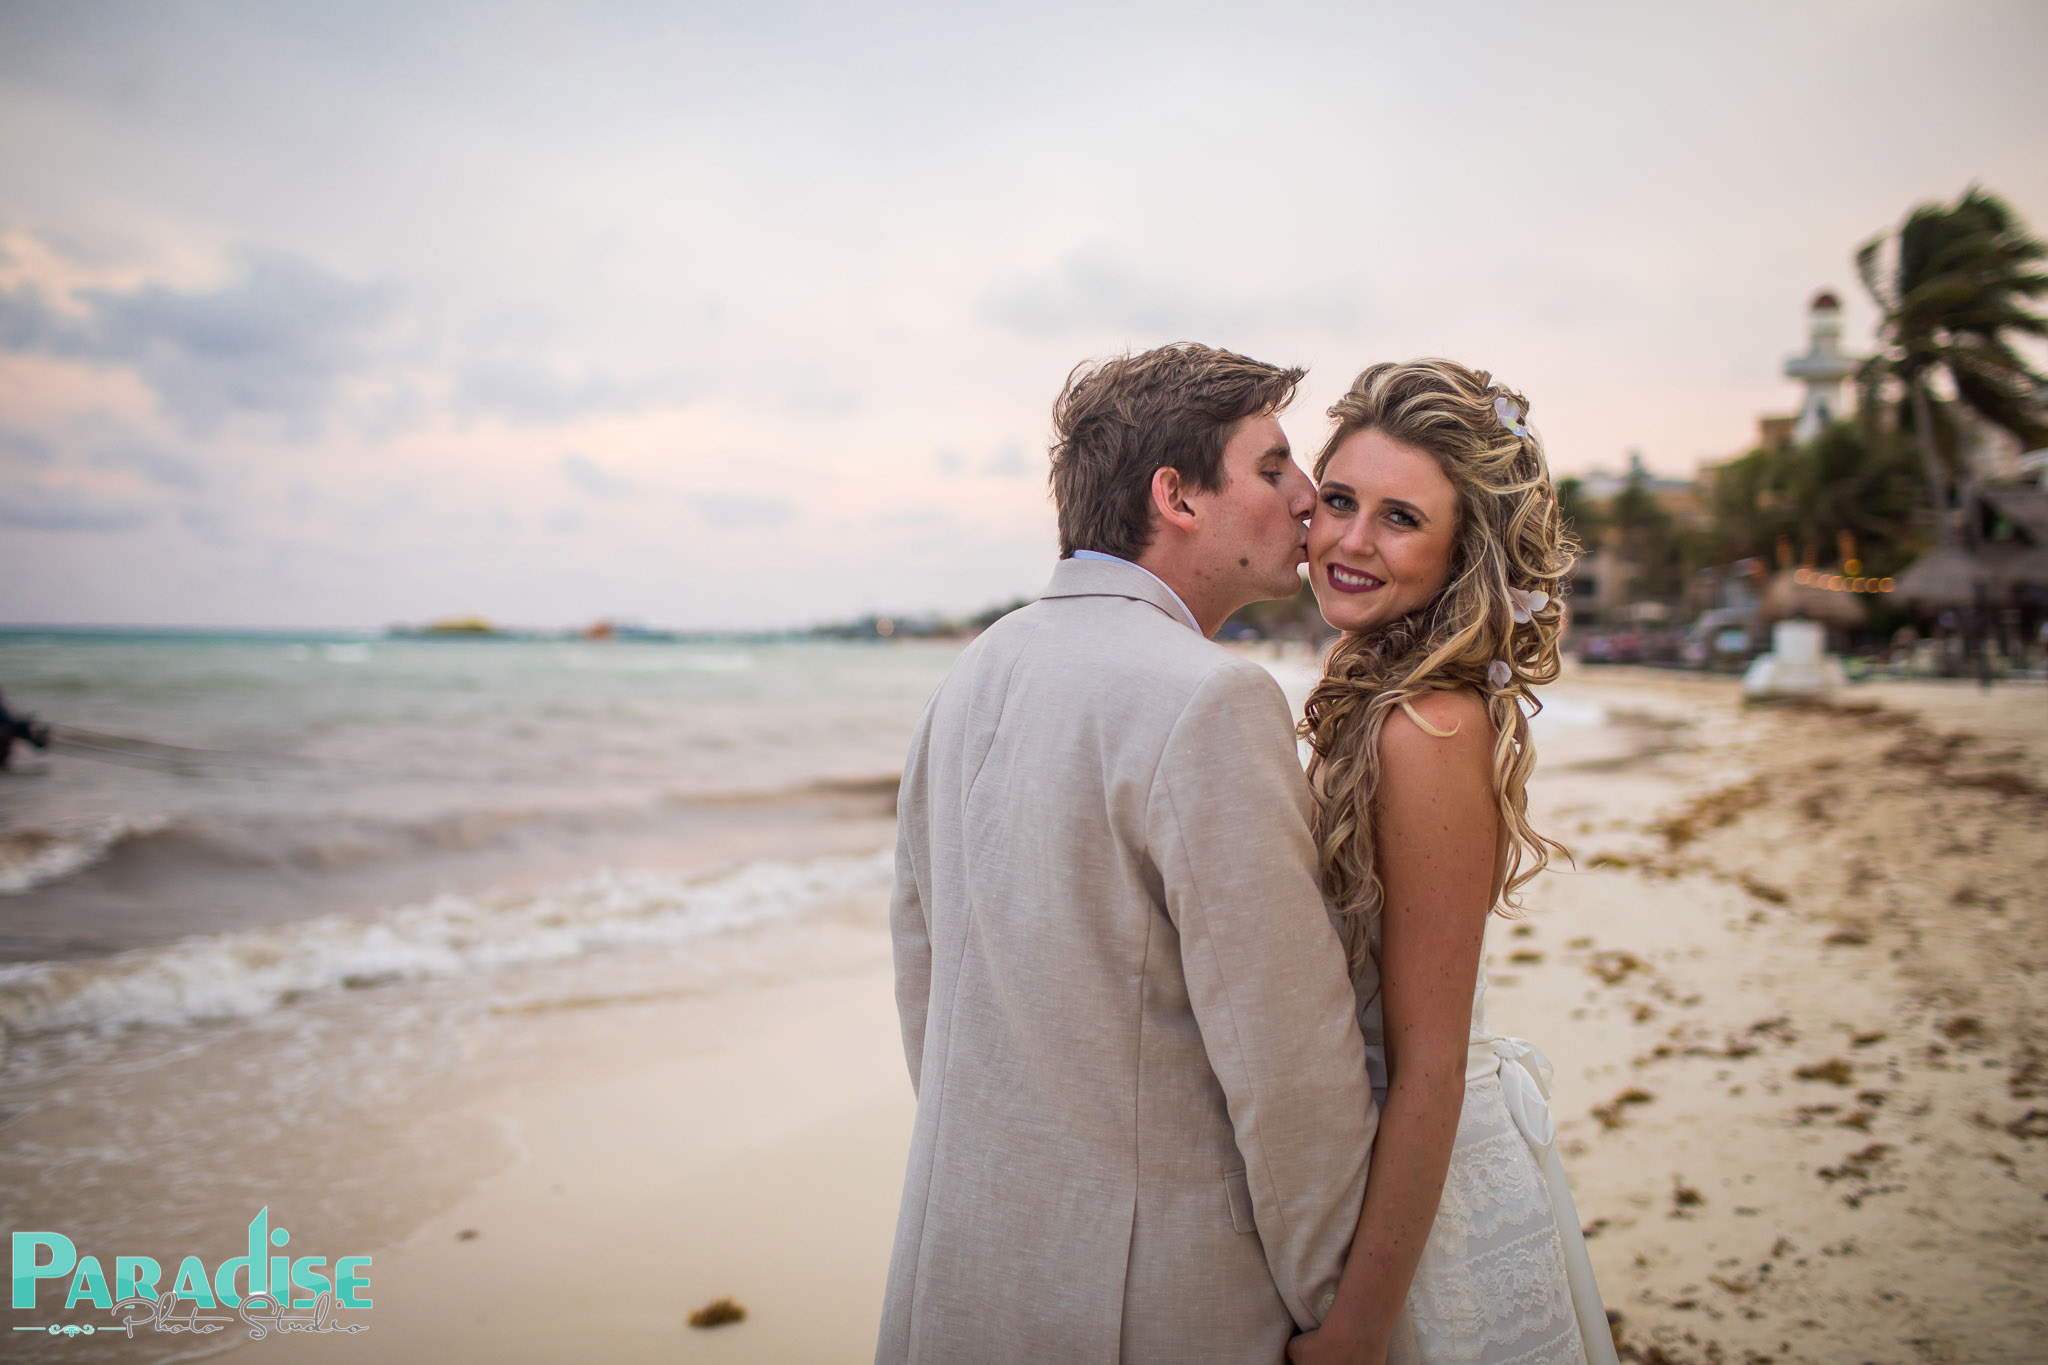 Mexico Destination Wedding Photographer Paradise Photo Studio